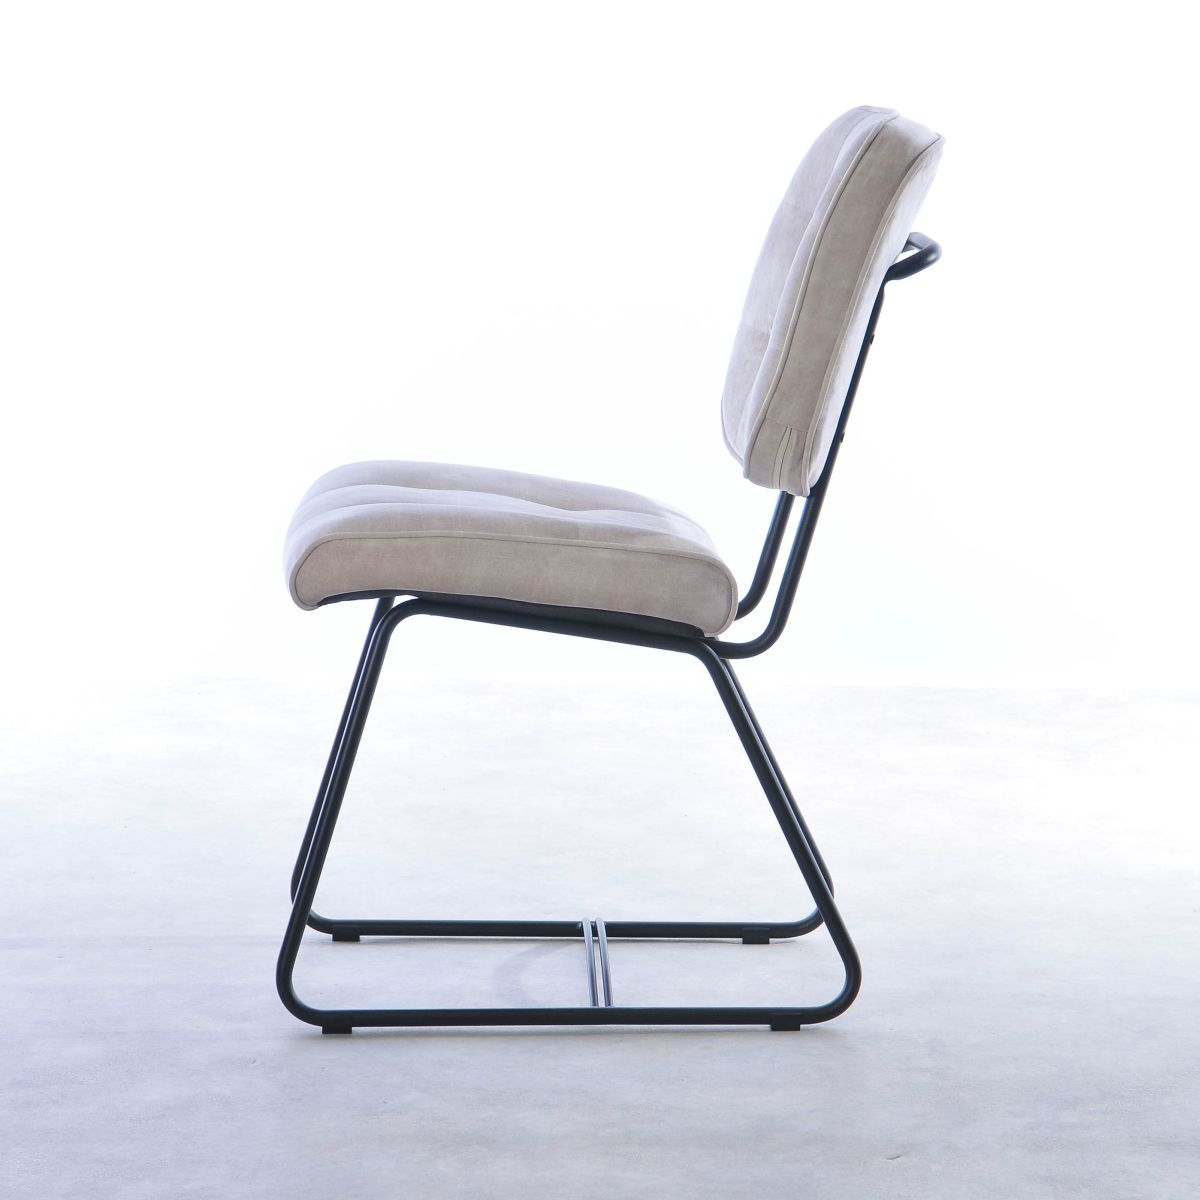 Dining room chair Jill